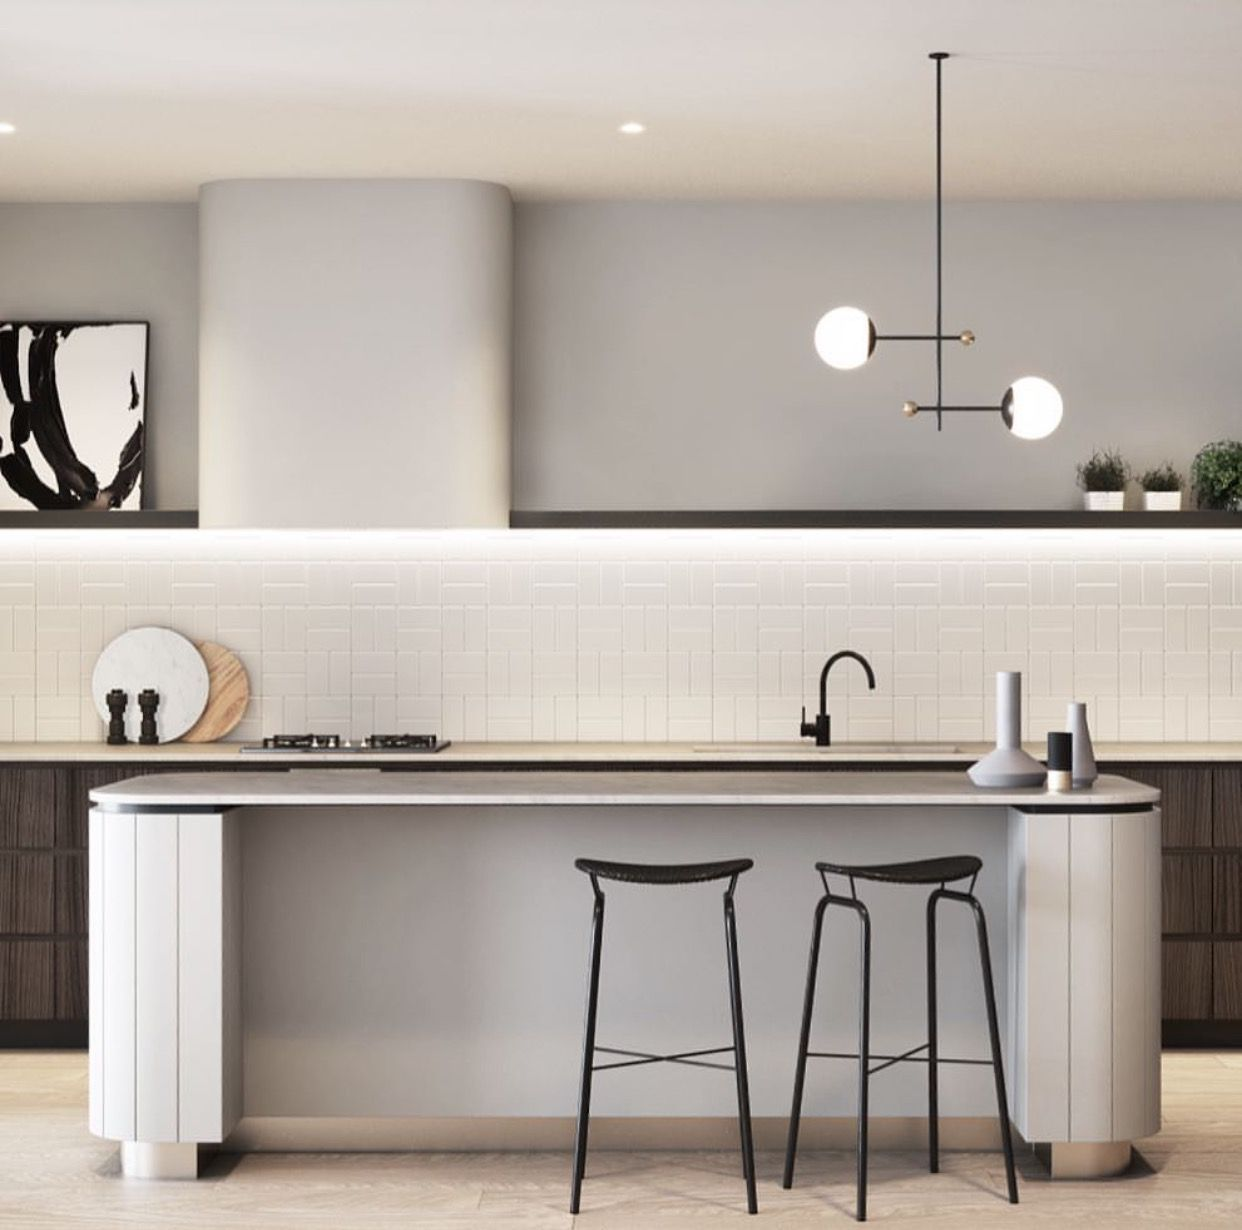 lowes kitchen design simple kitchen design tiles